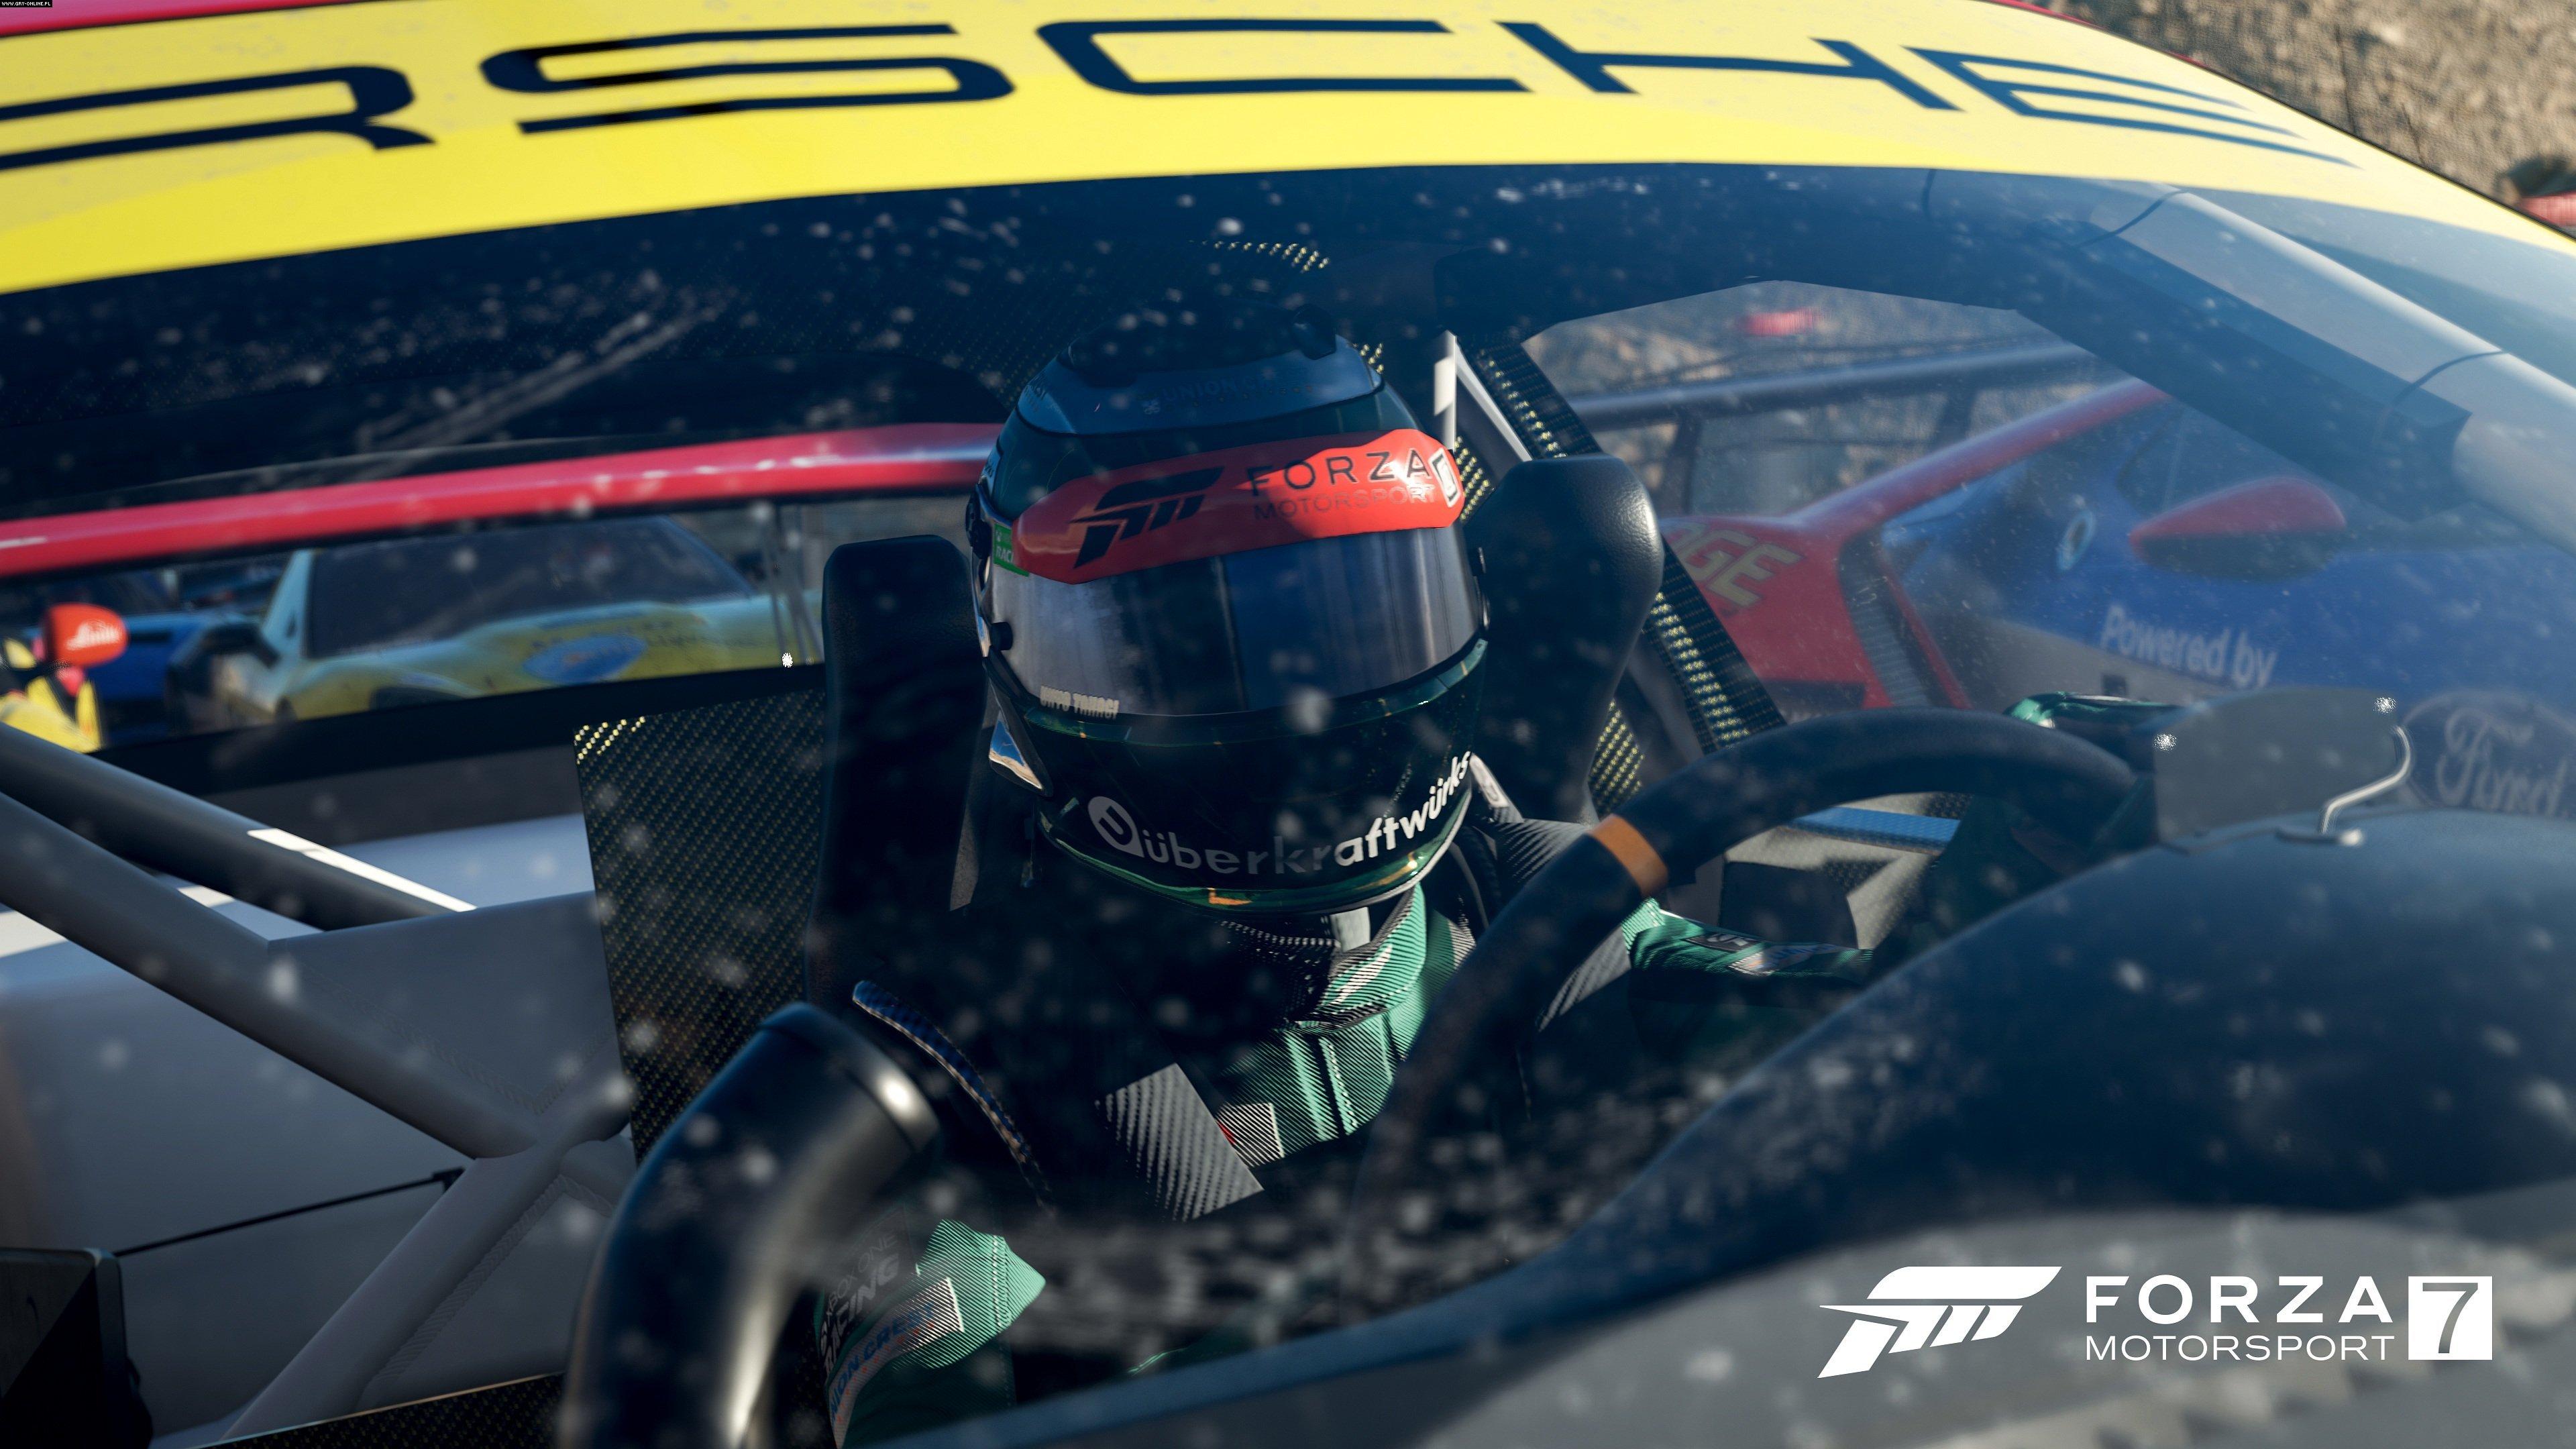 Forza Motorsport 7 XONE, PC Games Image 5/8, Turn 10 Studios, Microsoft Studios